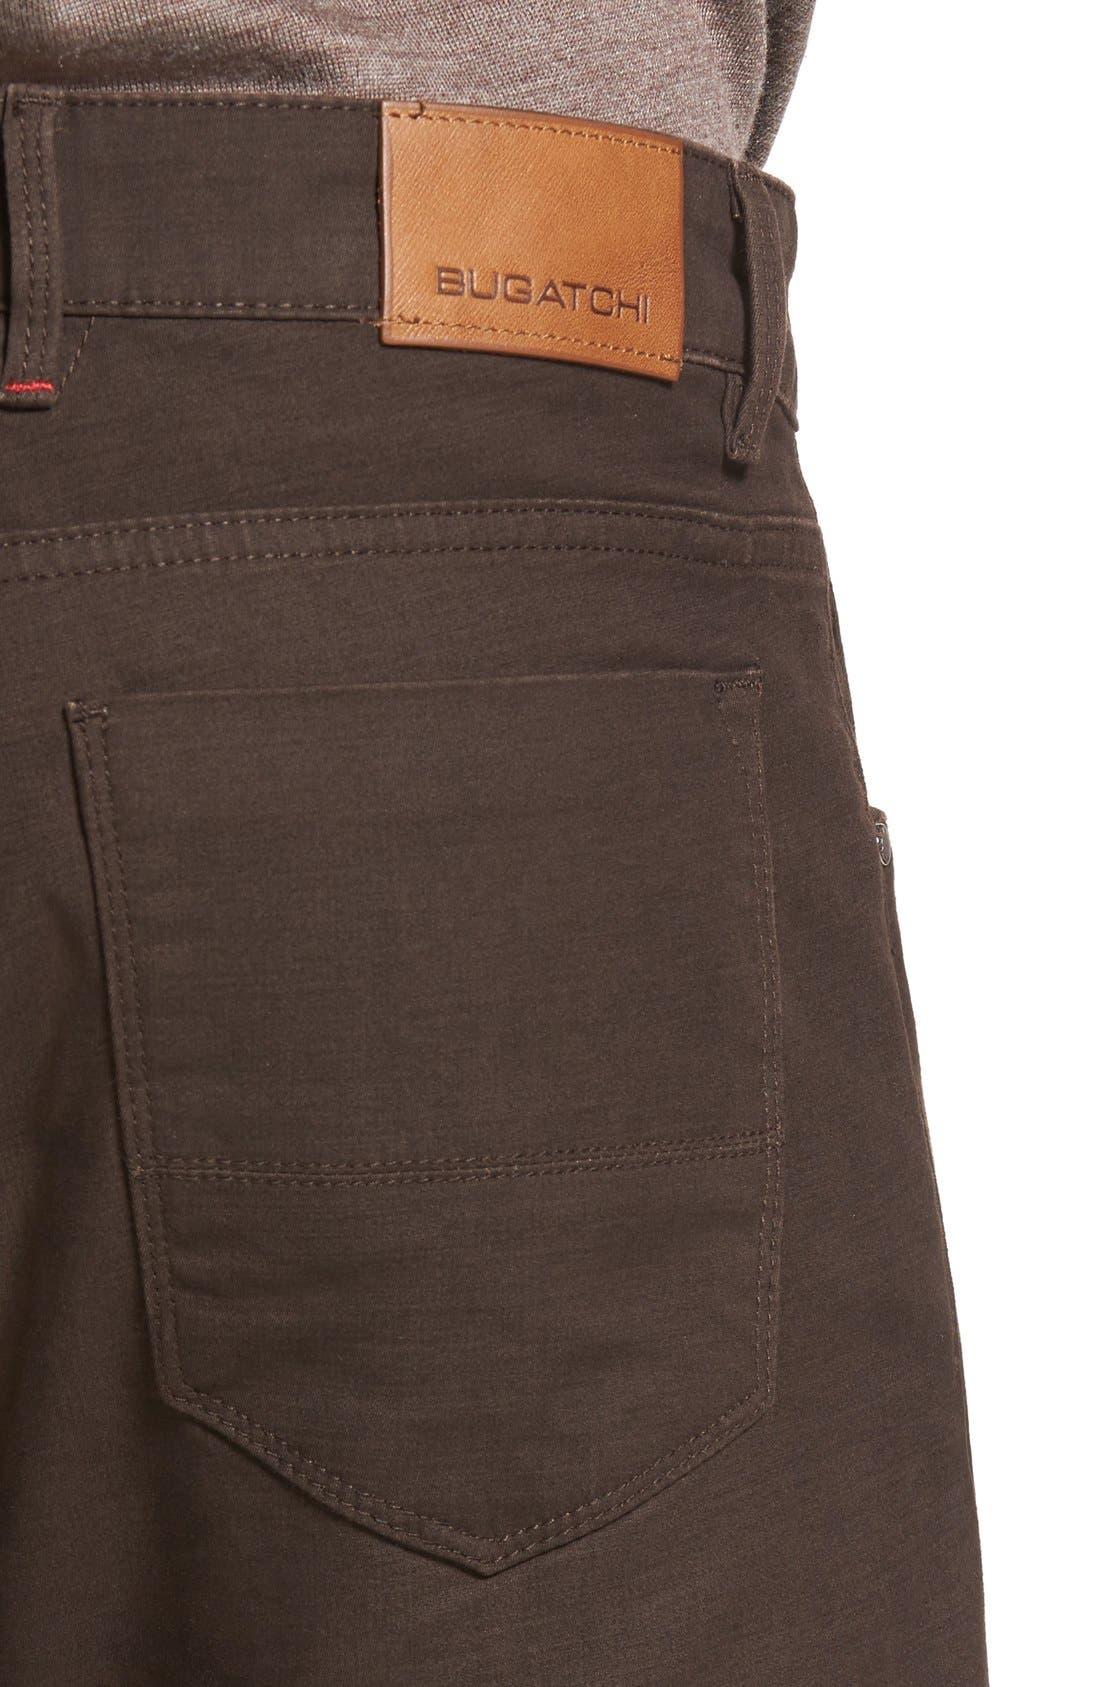 Slim Fit Five-Pocket Pants,                             Alternate thumbnail 4, color,                             Mocha